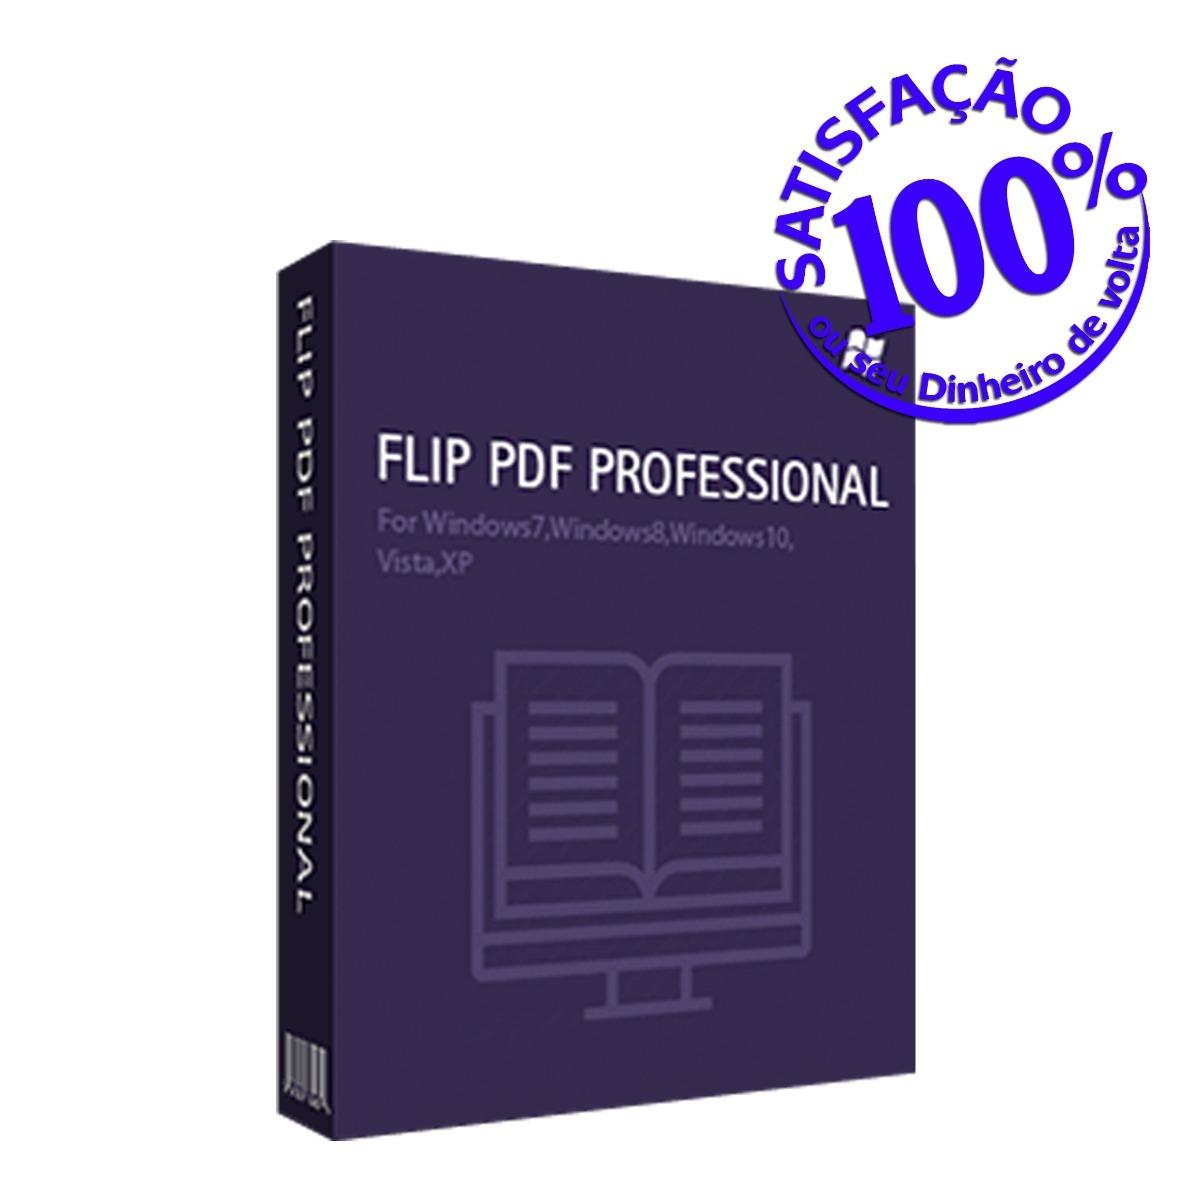 Flip pdf professional 24 r 6990 em mercado livre flip pdf professional 24 carregando zoom ccuart Image collections